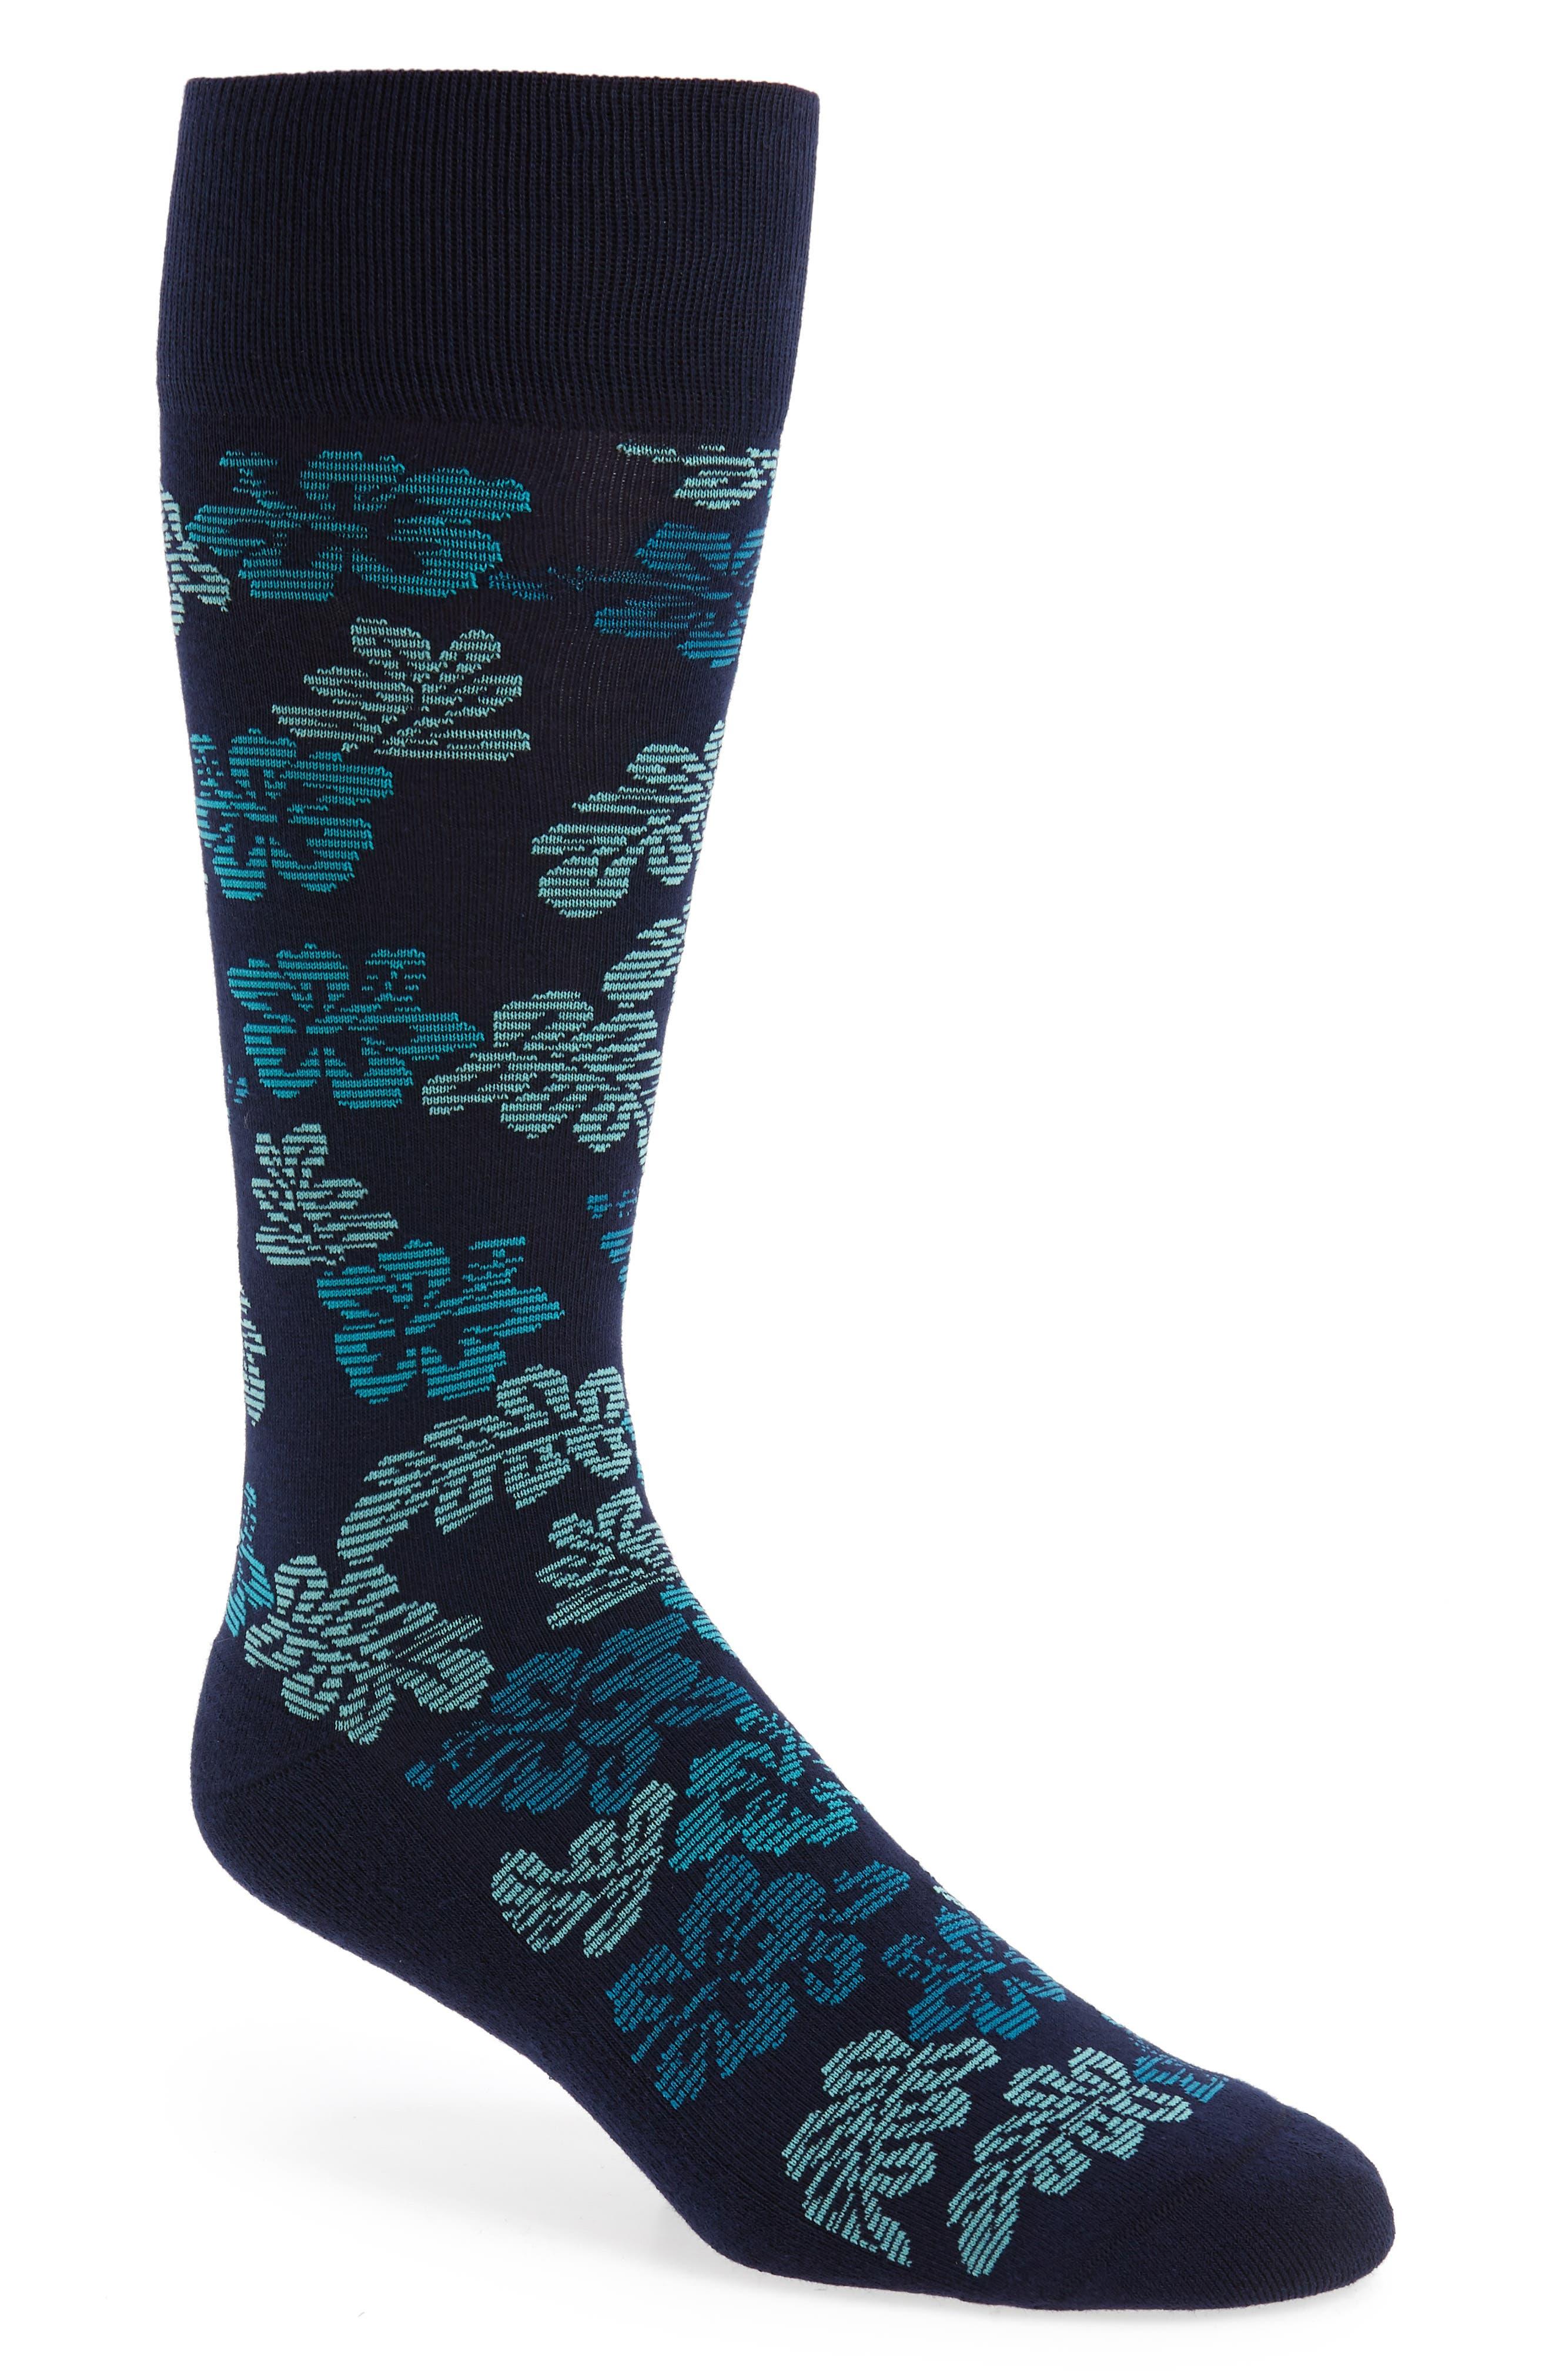 Nordstrom Men's Shop Hibiscus Vibe Socks (3 for $30)